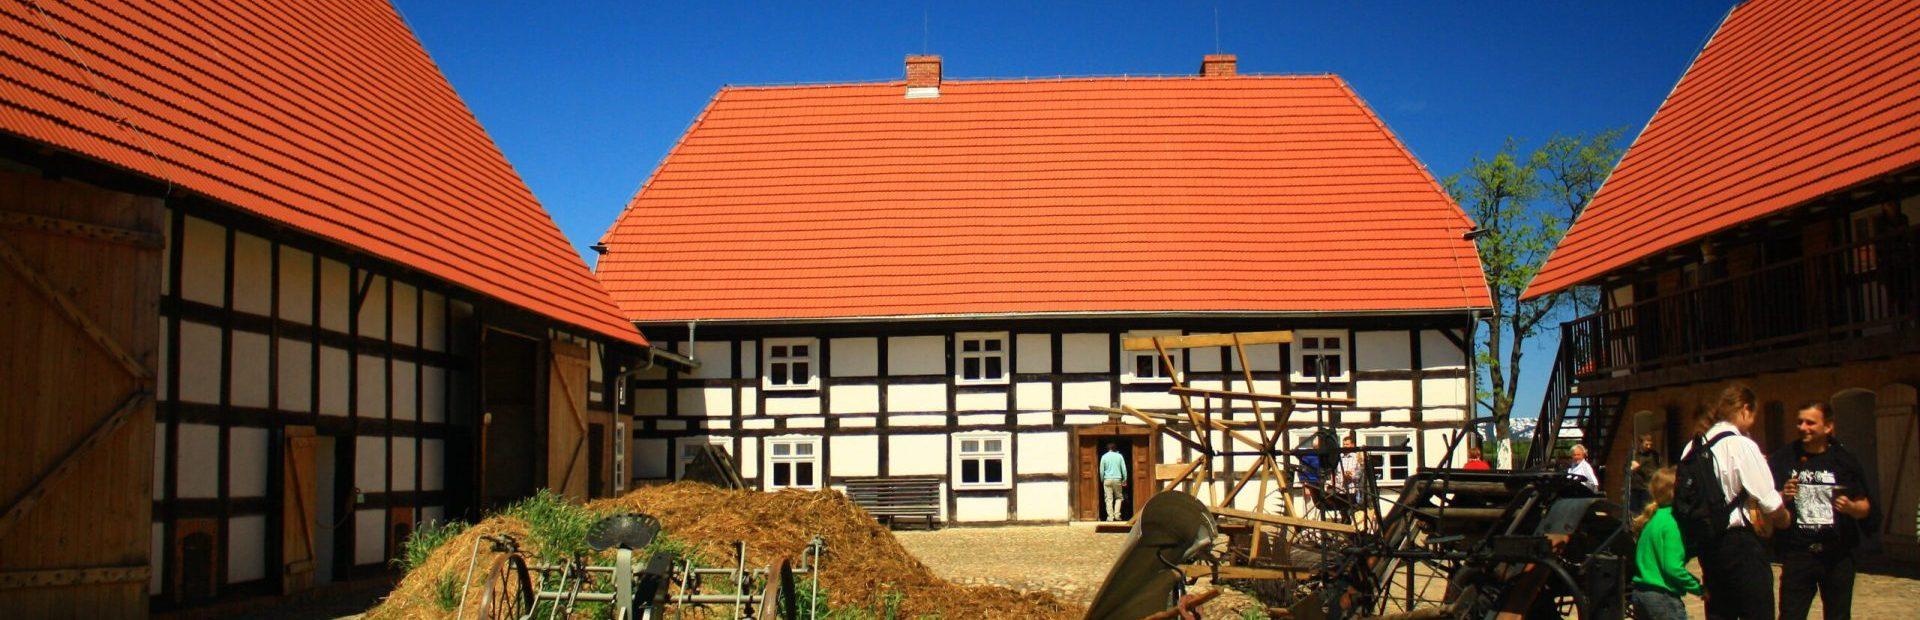 The Museum of Pomeranian Folk Culture in Swołowo